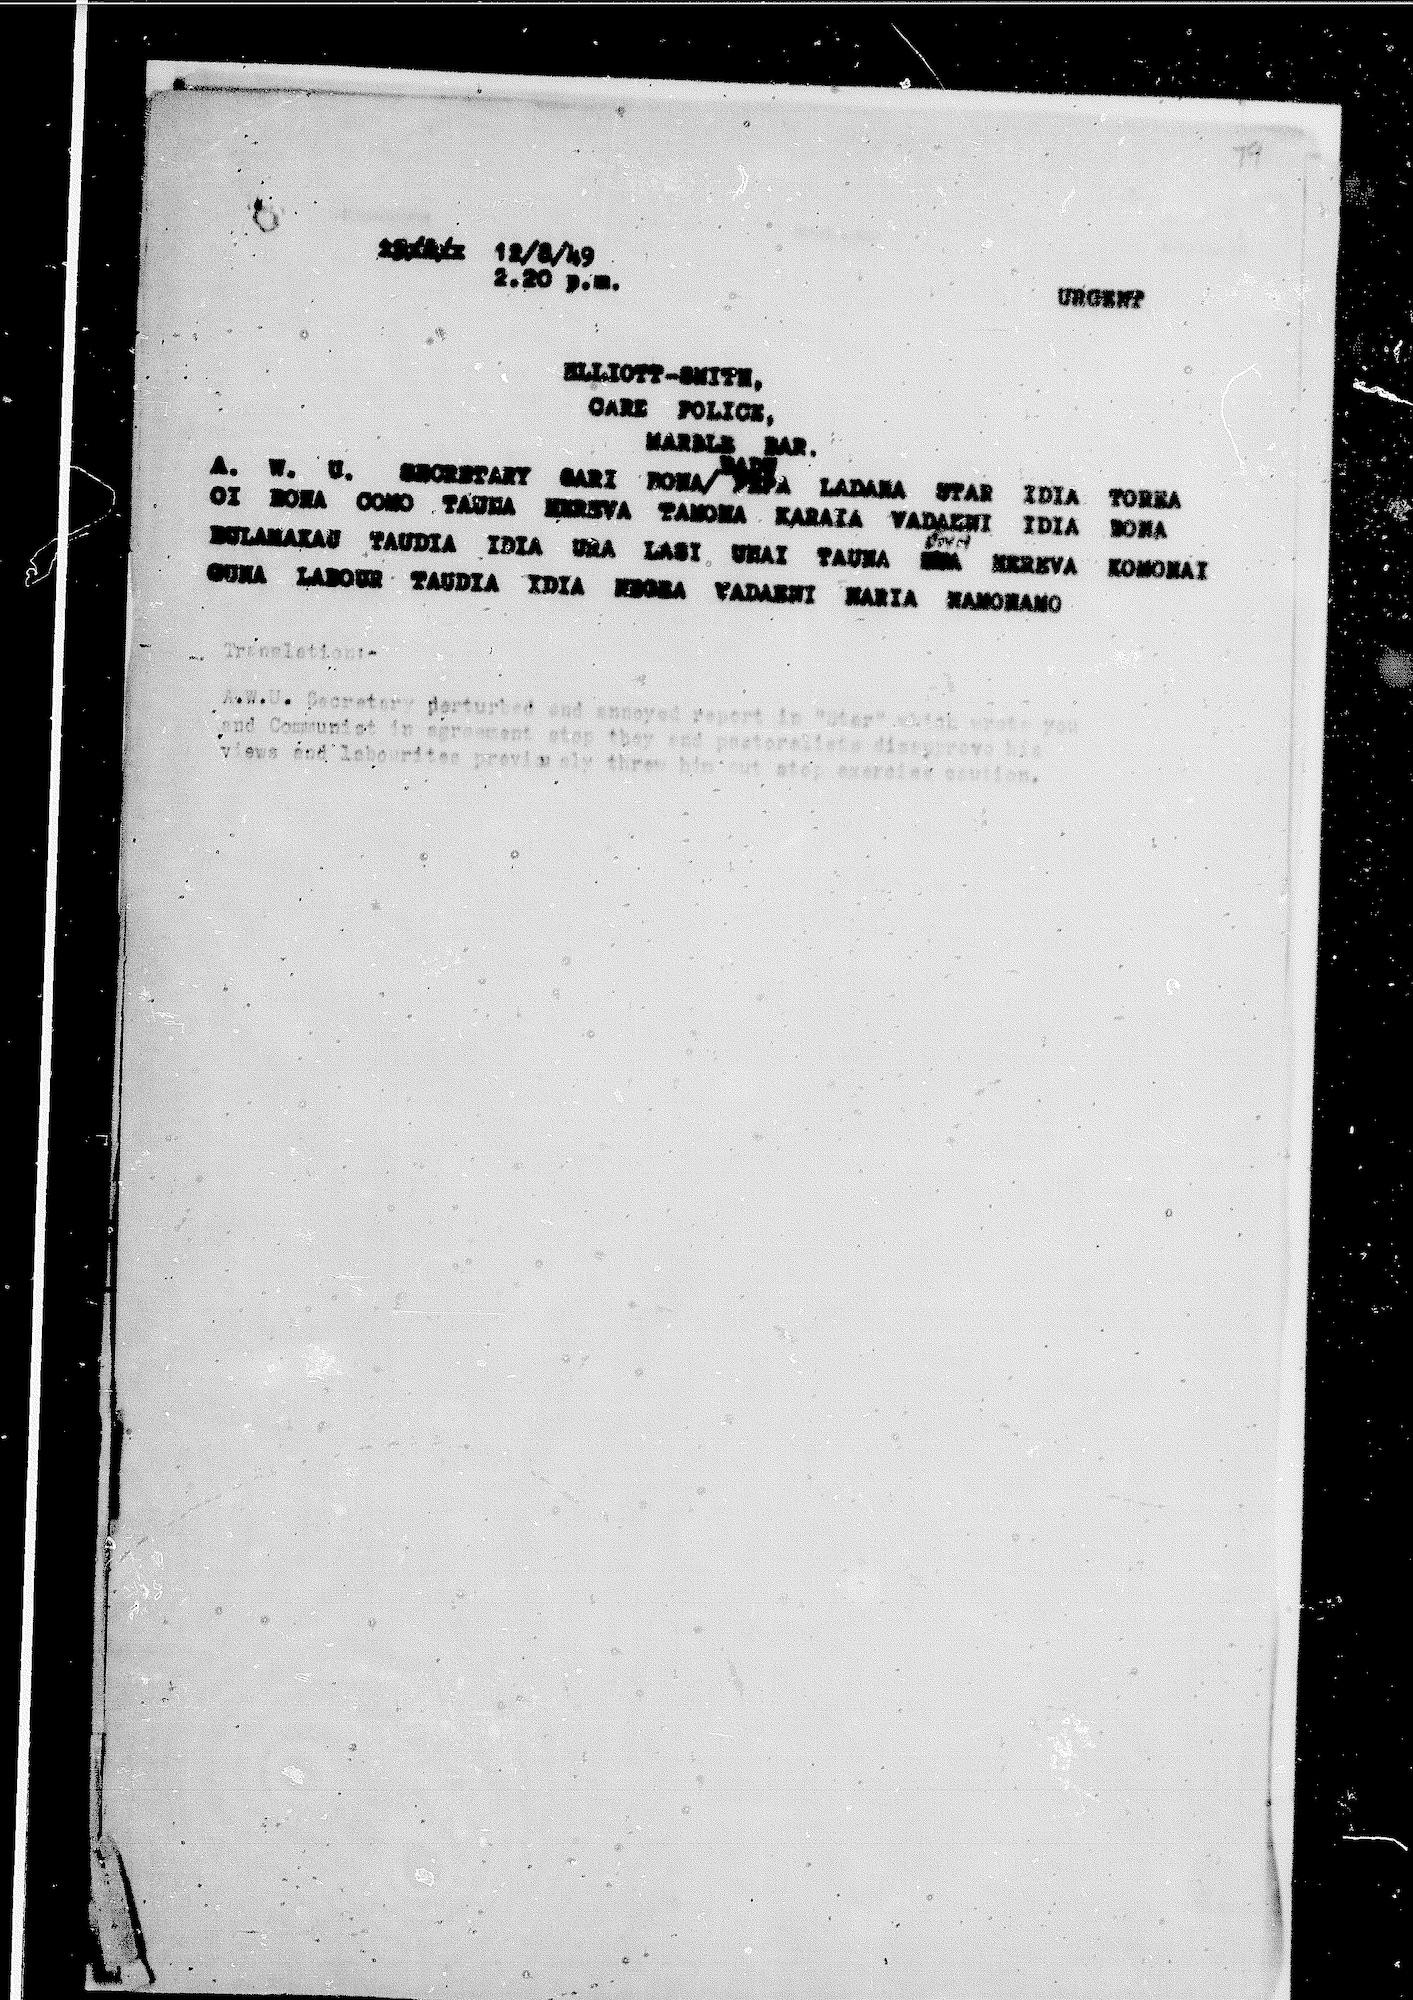 Middleton to Elliott-Smith, 12 August 1949